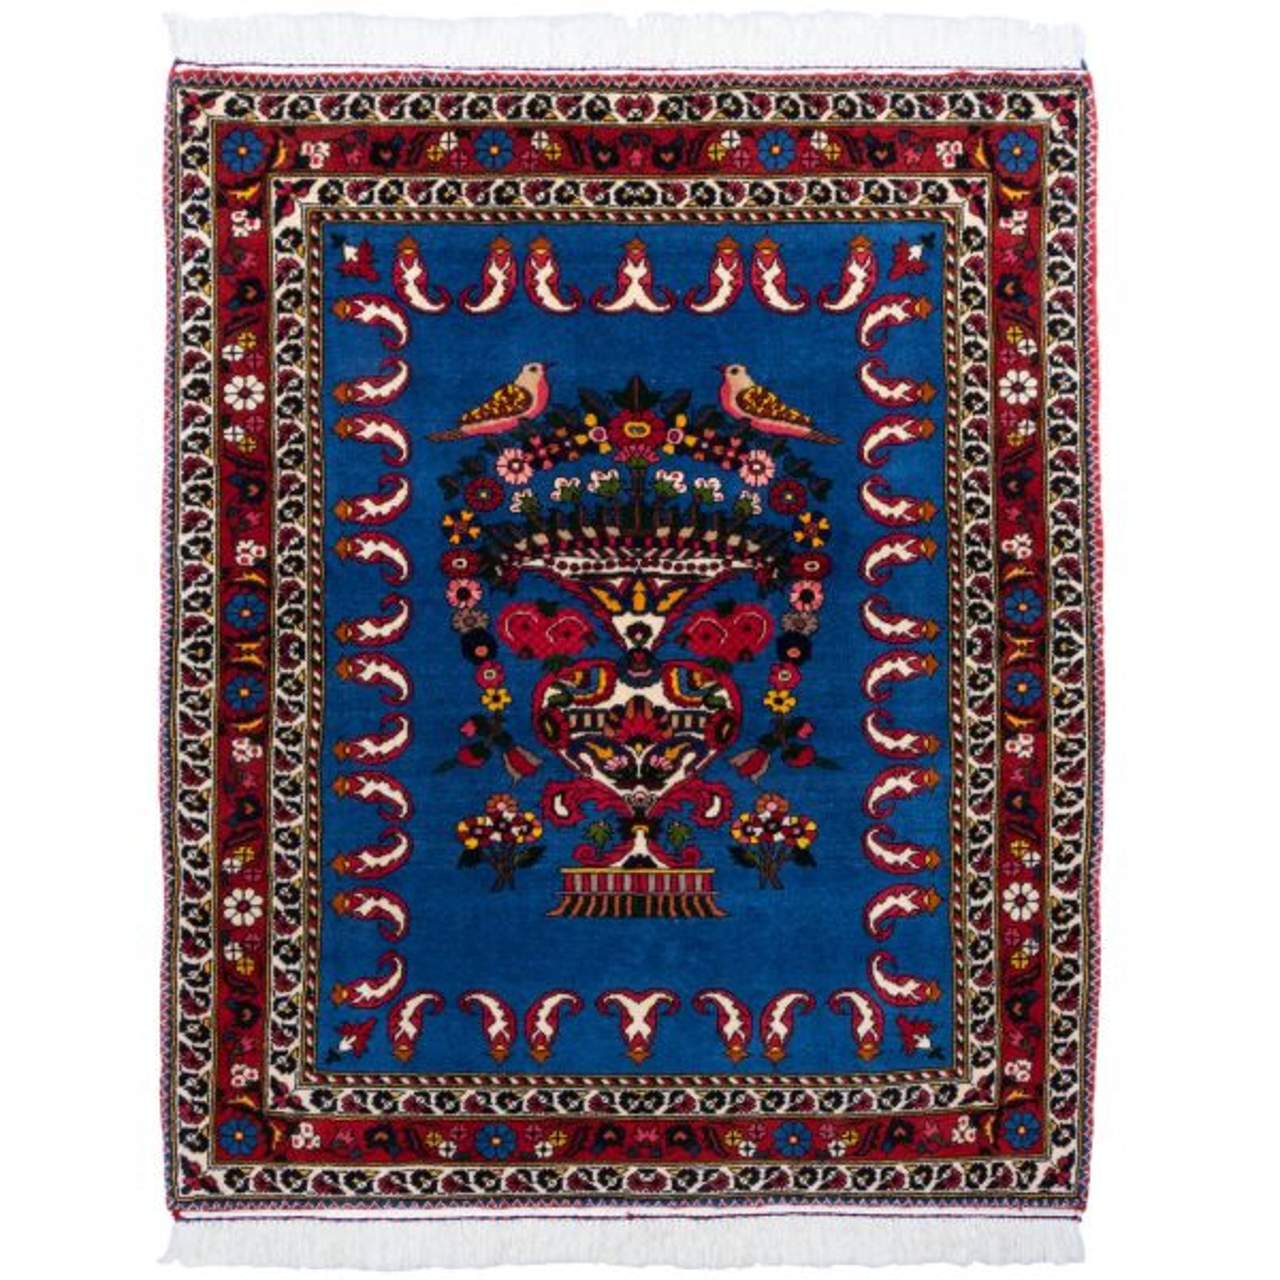 فرش دستباف ذرع و نیم سی پرشیا کد 178080